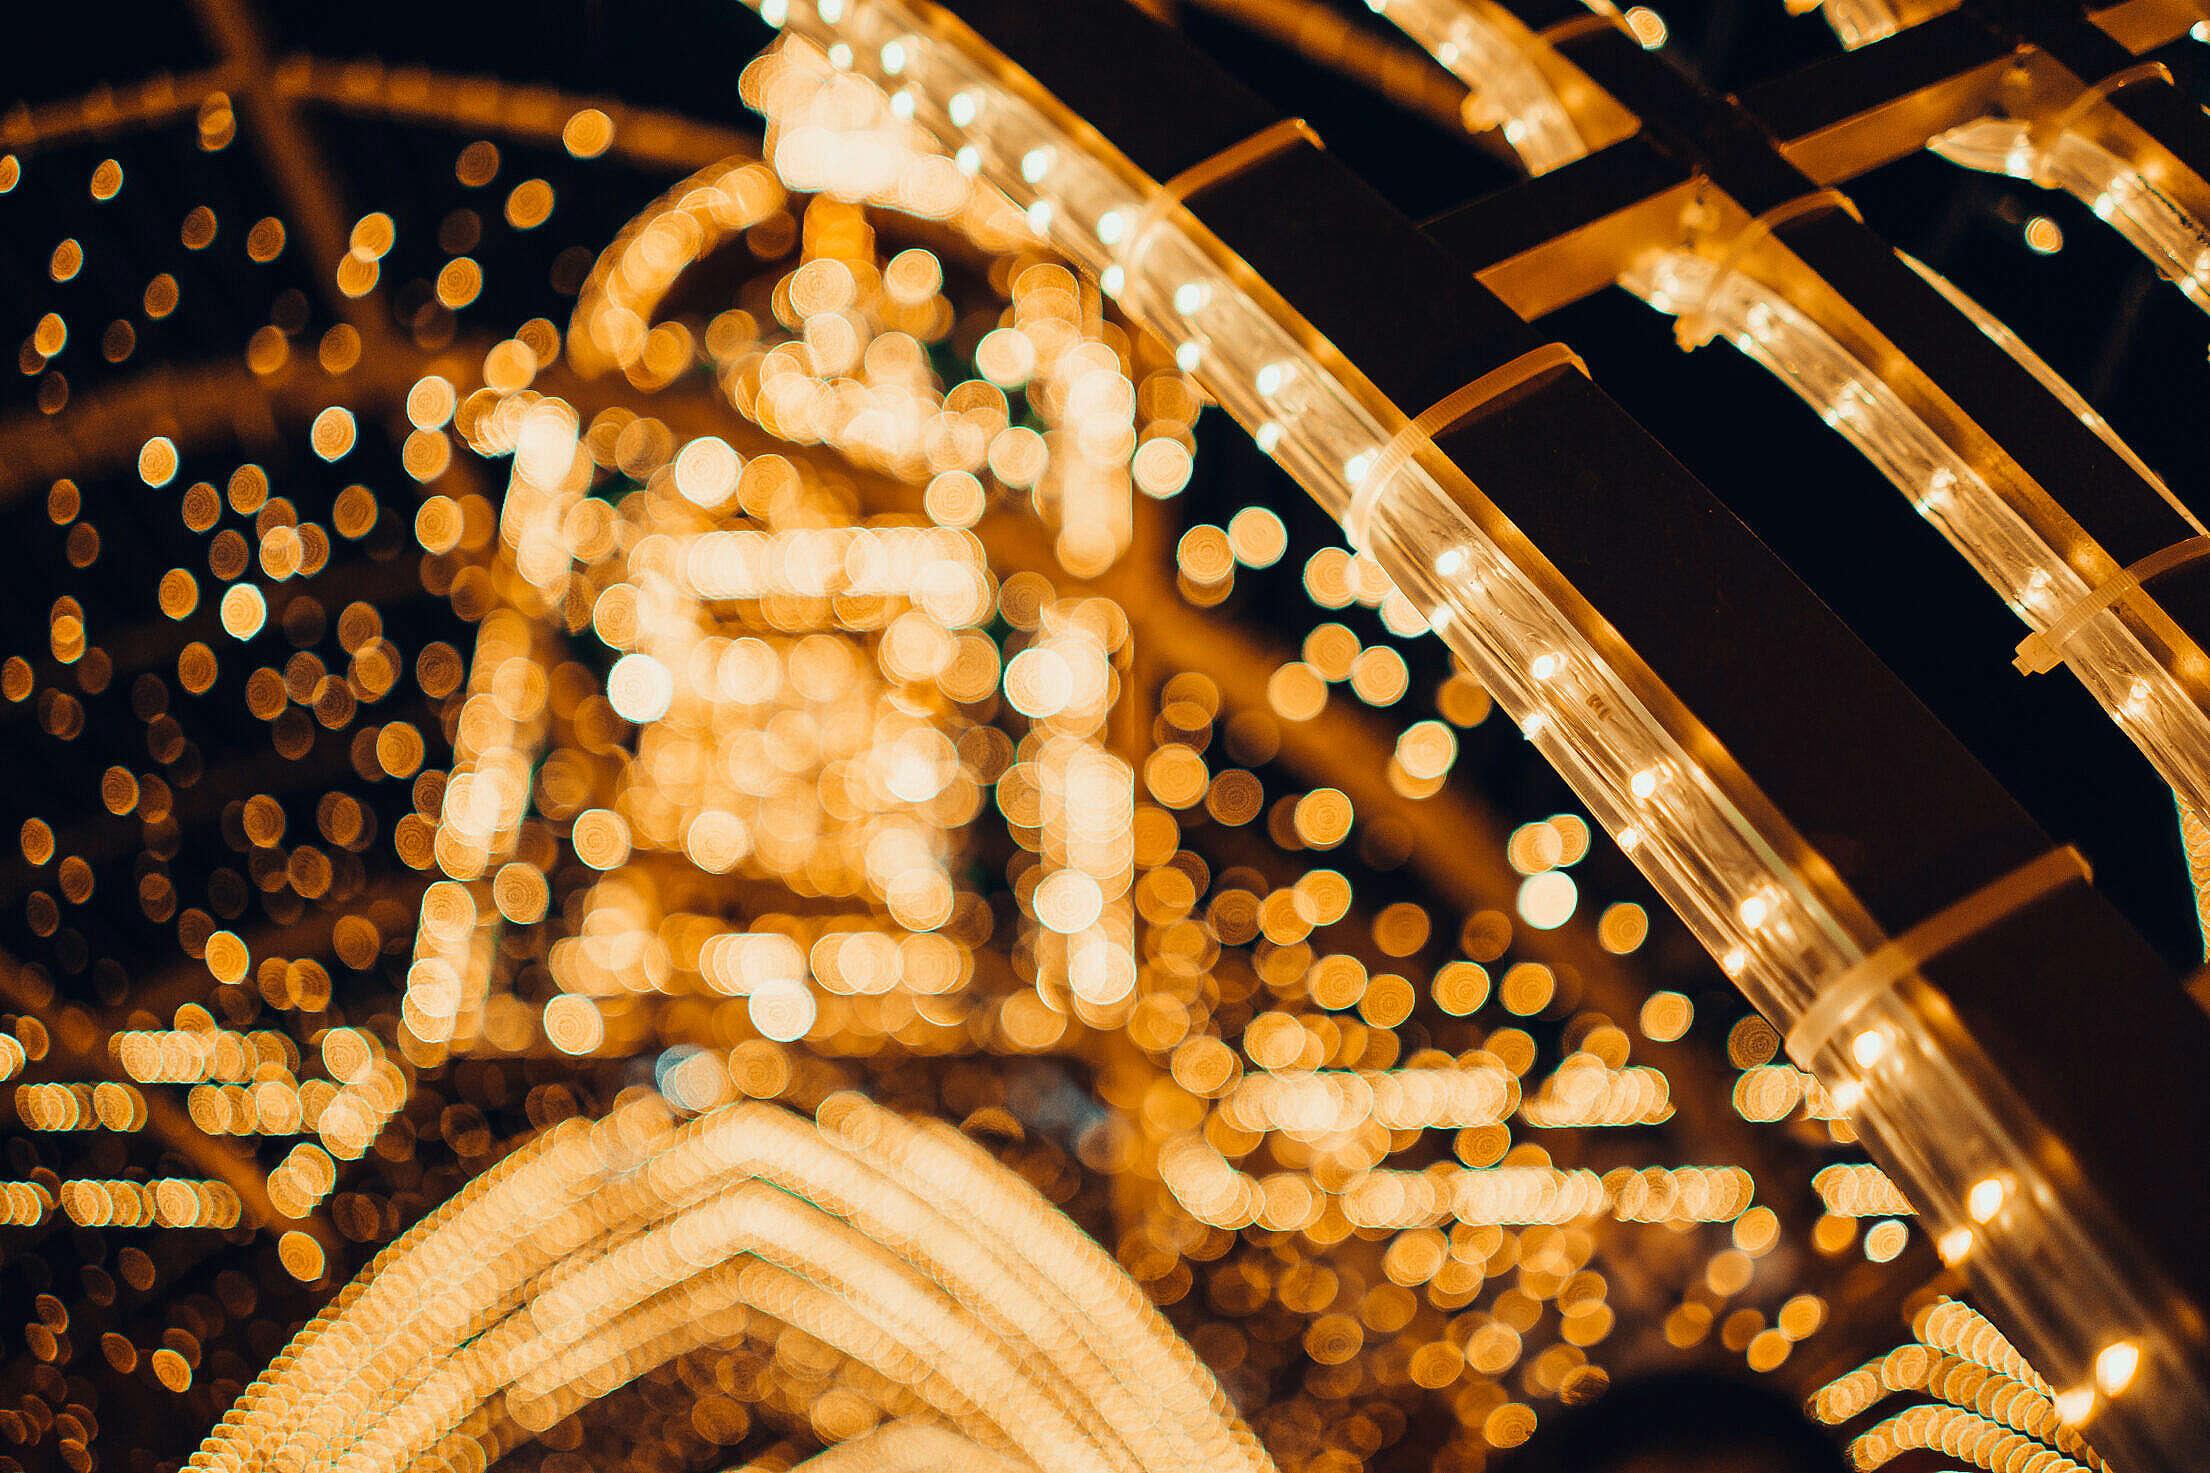 Luminous Decorations on Christmas Market Free Stock Photo